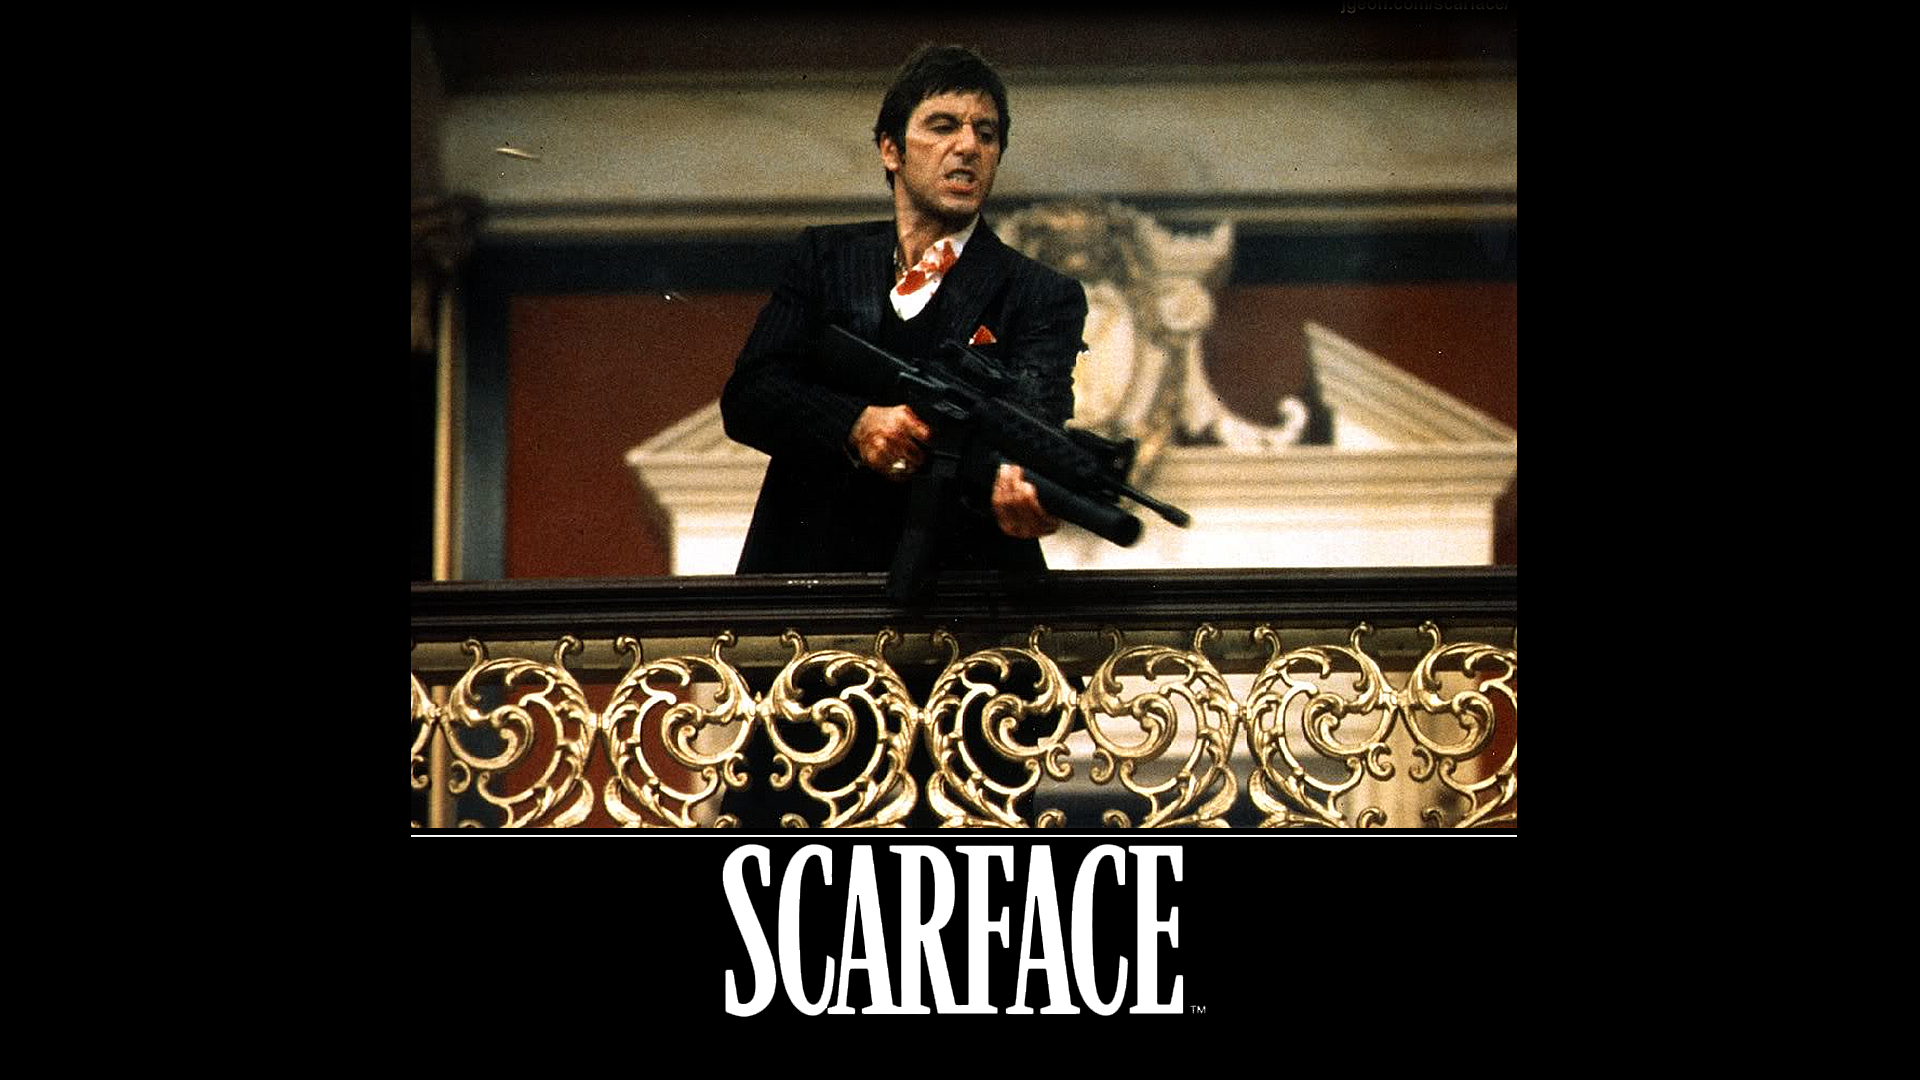 Scarface backgrounds wallpapersafari - Scarface background ...